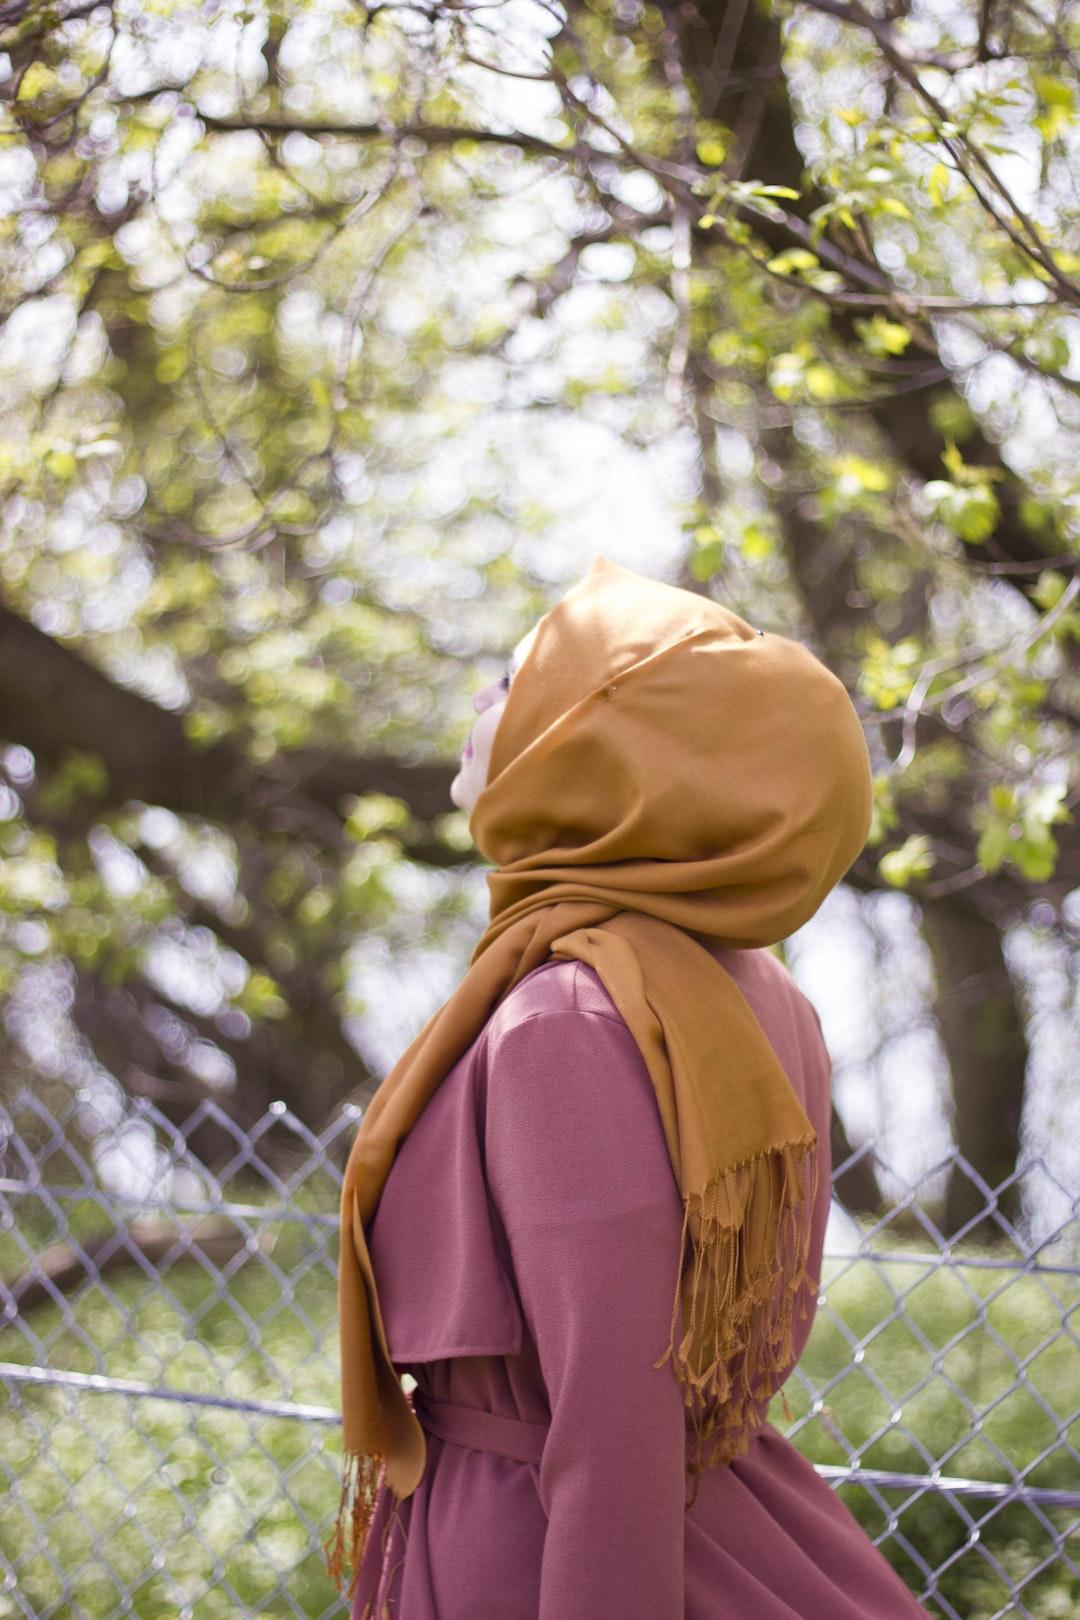 Woman in hijab enjoying the summer breeze under trees.